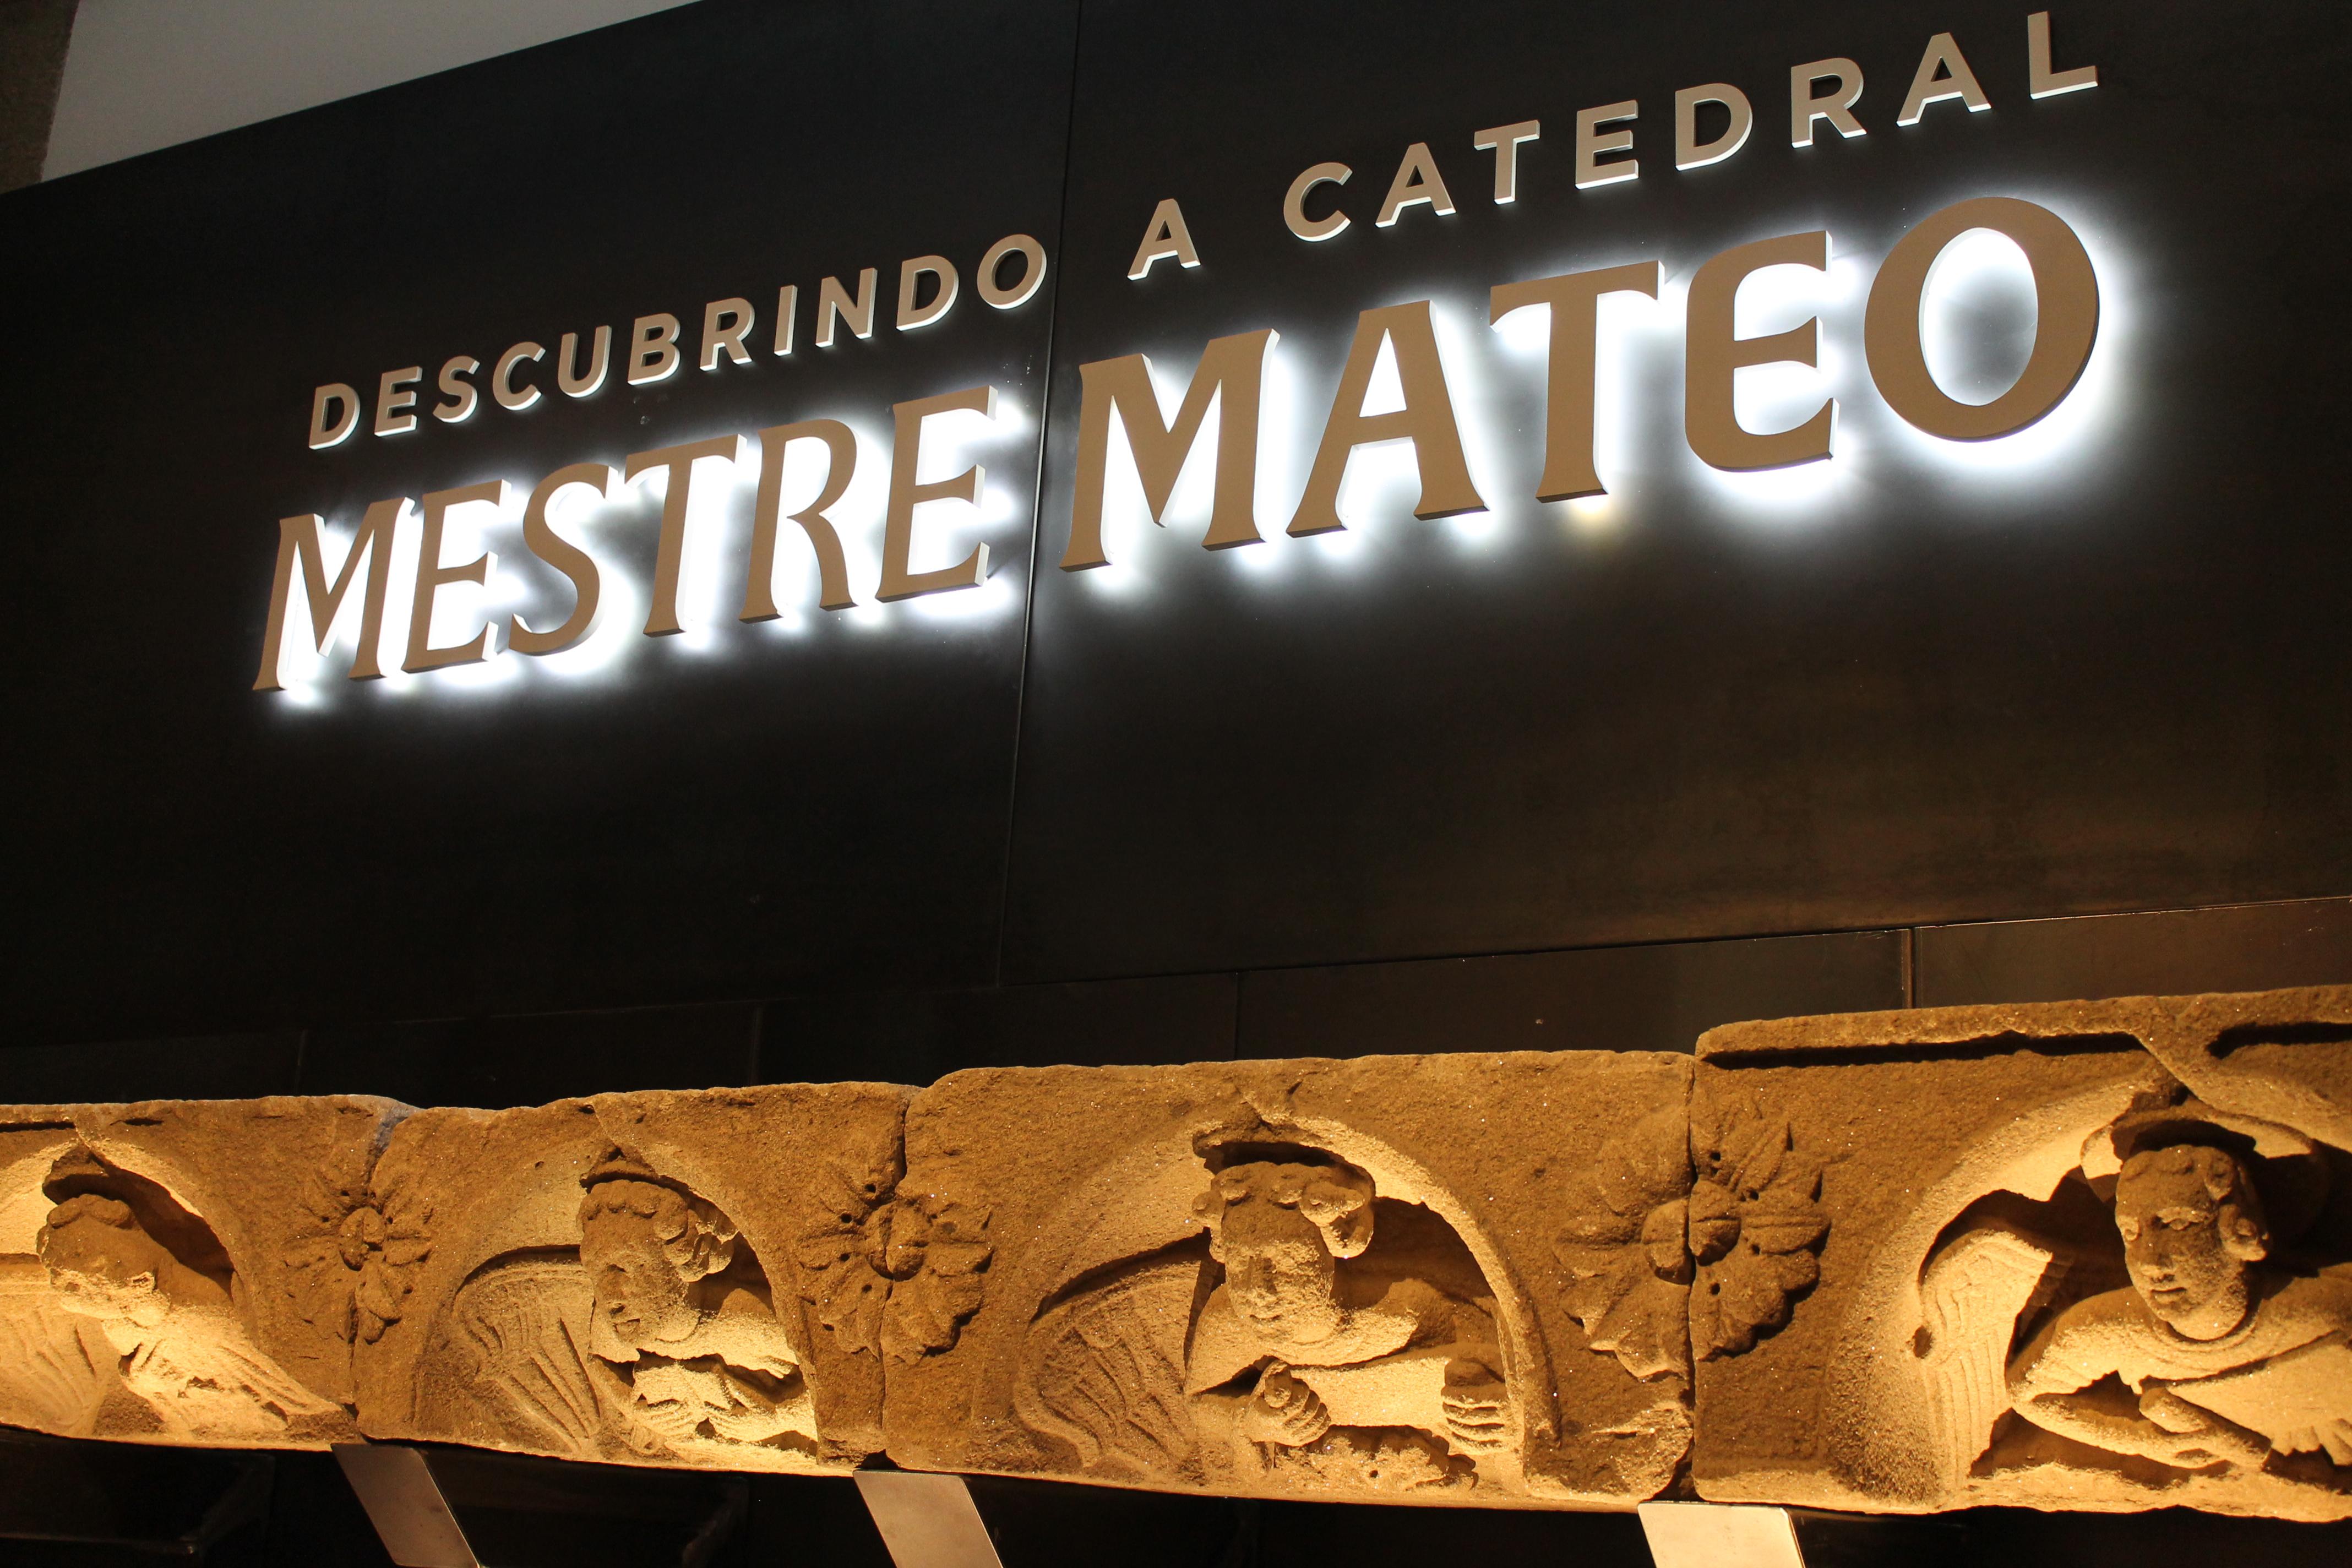 http://catedraldesantiago.es/wp-content/uploads/2018/04/2018-04-17-13.38.58.jpg